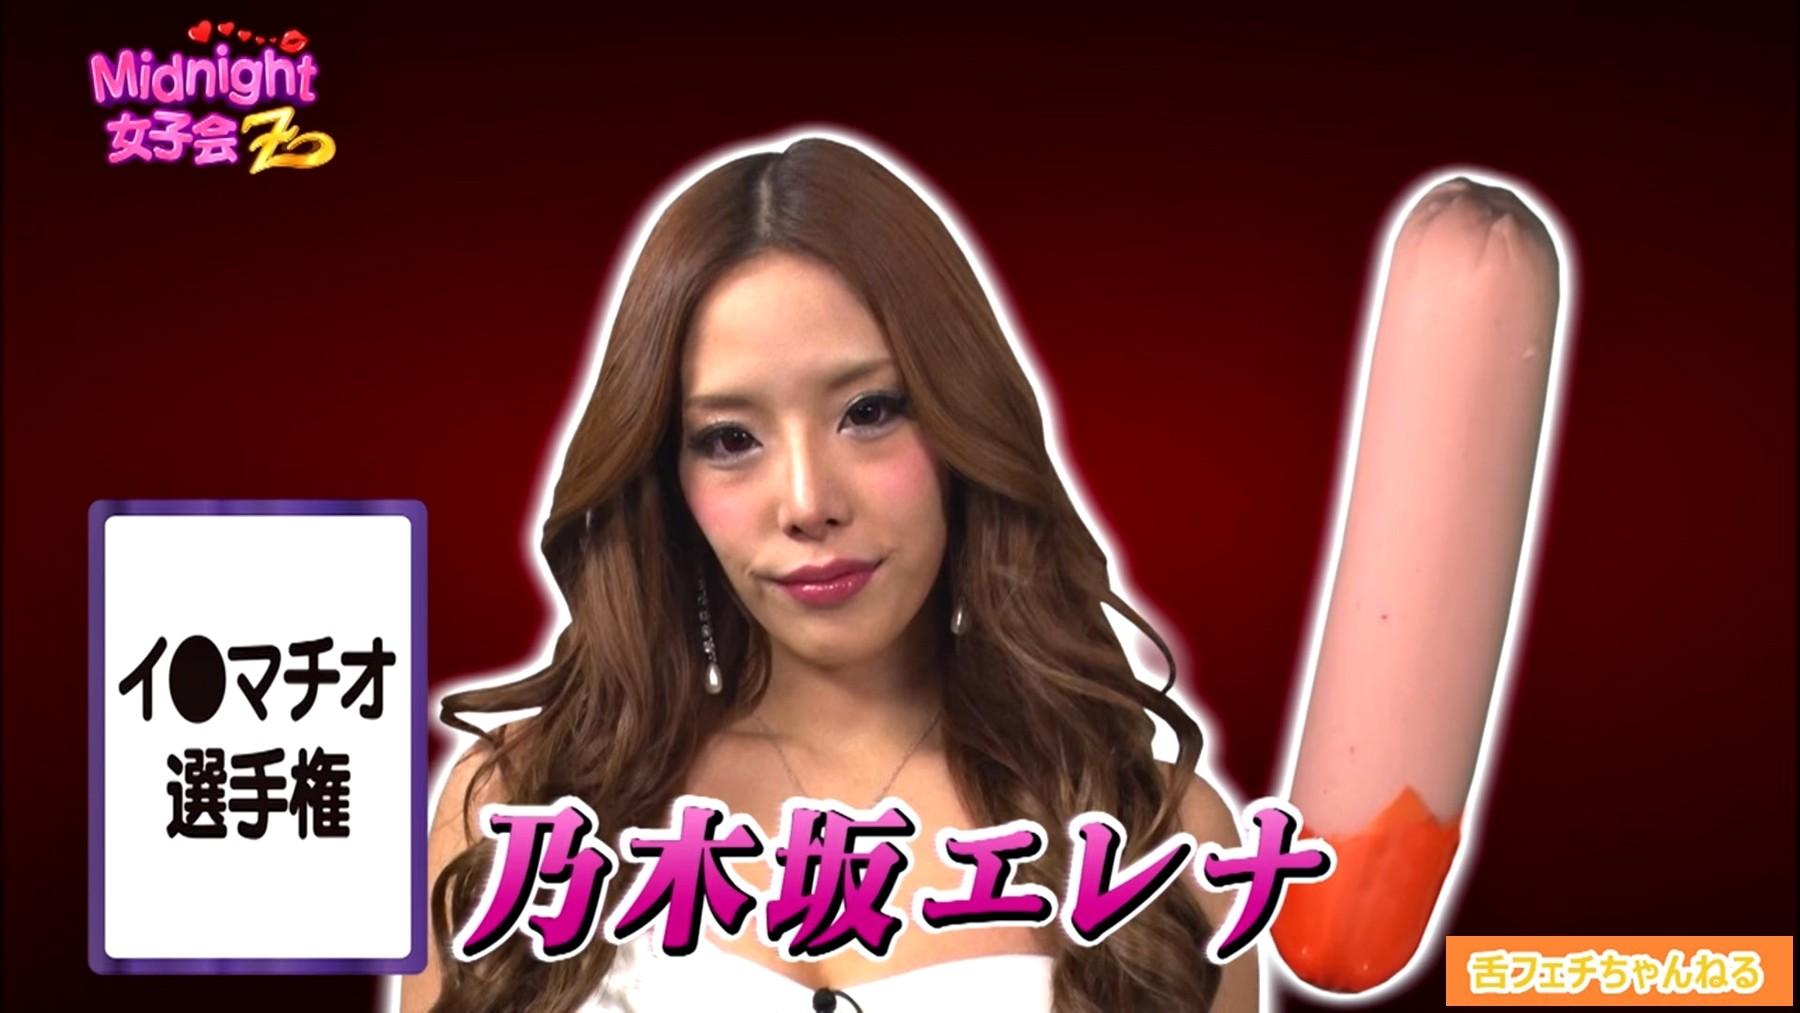 Midnight女子会 イラマチオ選手権 (20)